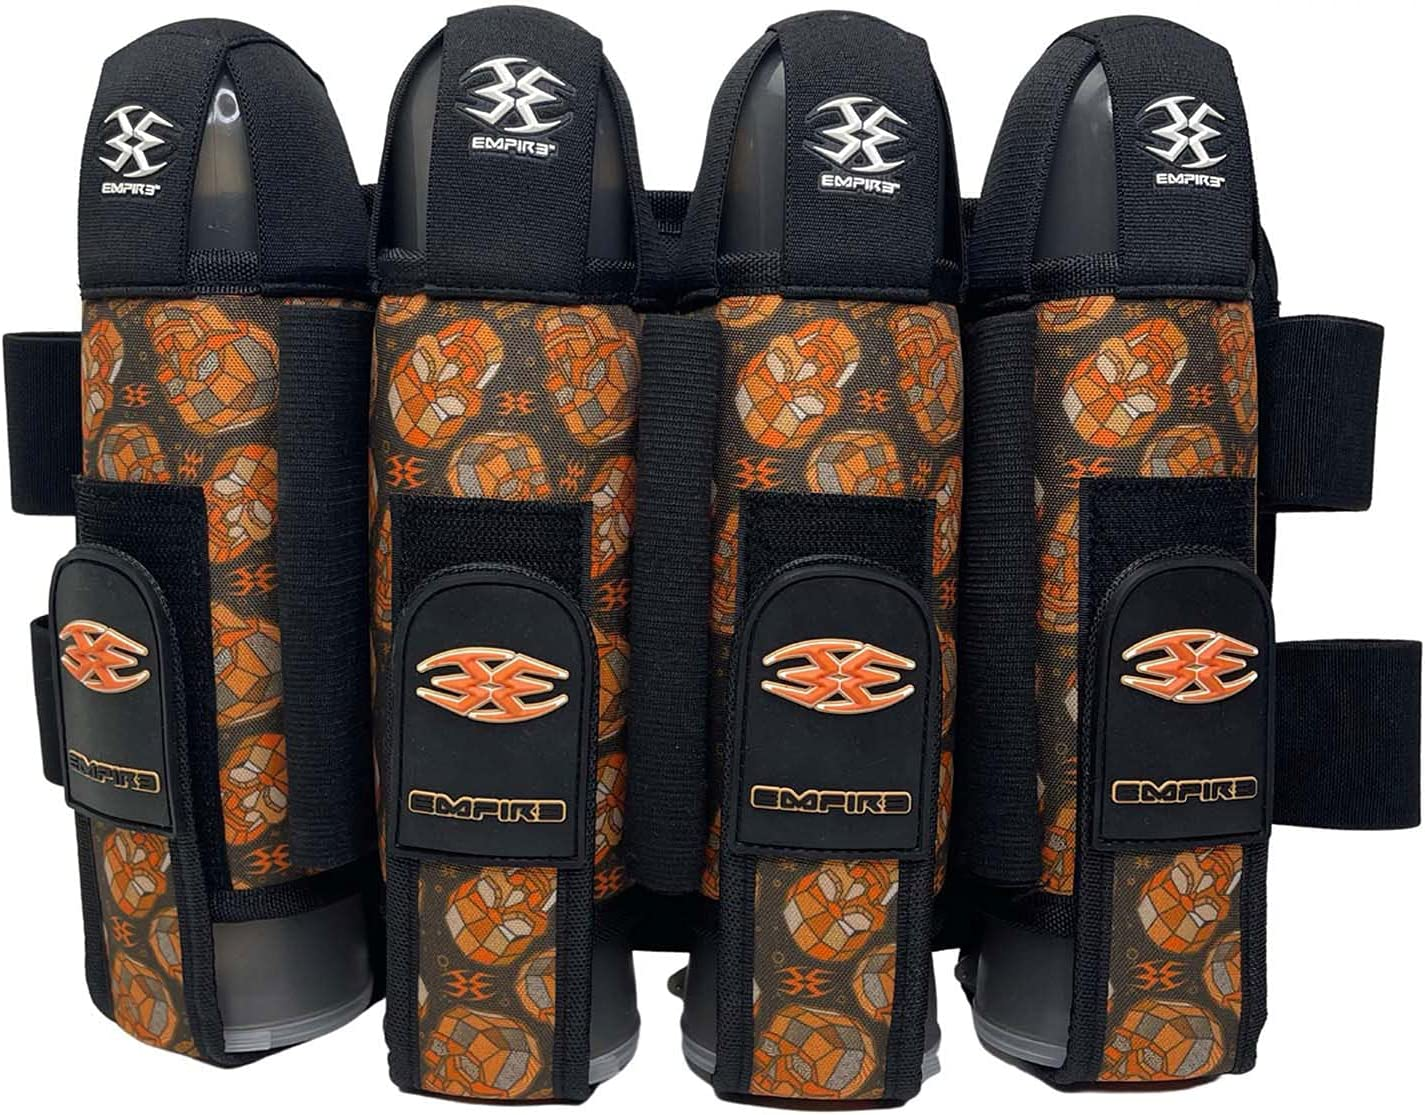 Empire NXE New Orleans Mall Pro Level Harness - 7 4 PolySkull Orange + Lowest price challenge